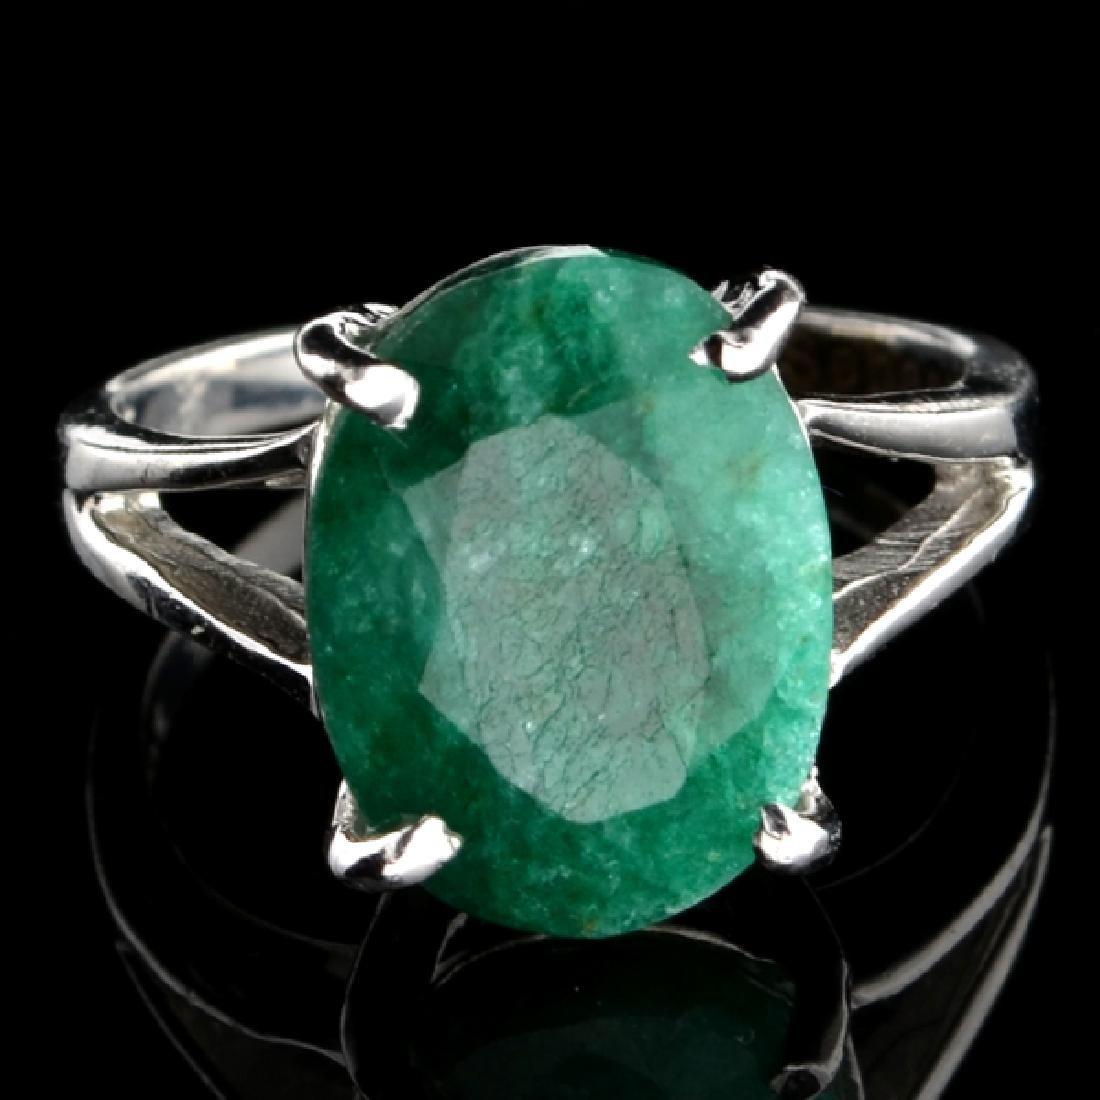 Fine Jewelry Designer Sebastian 5.50CT Oval Cut Green